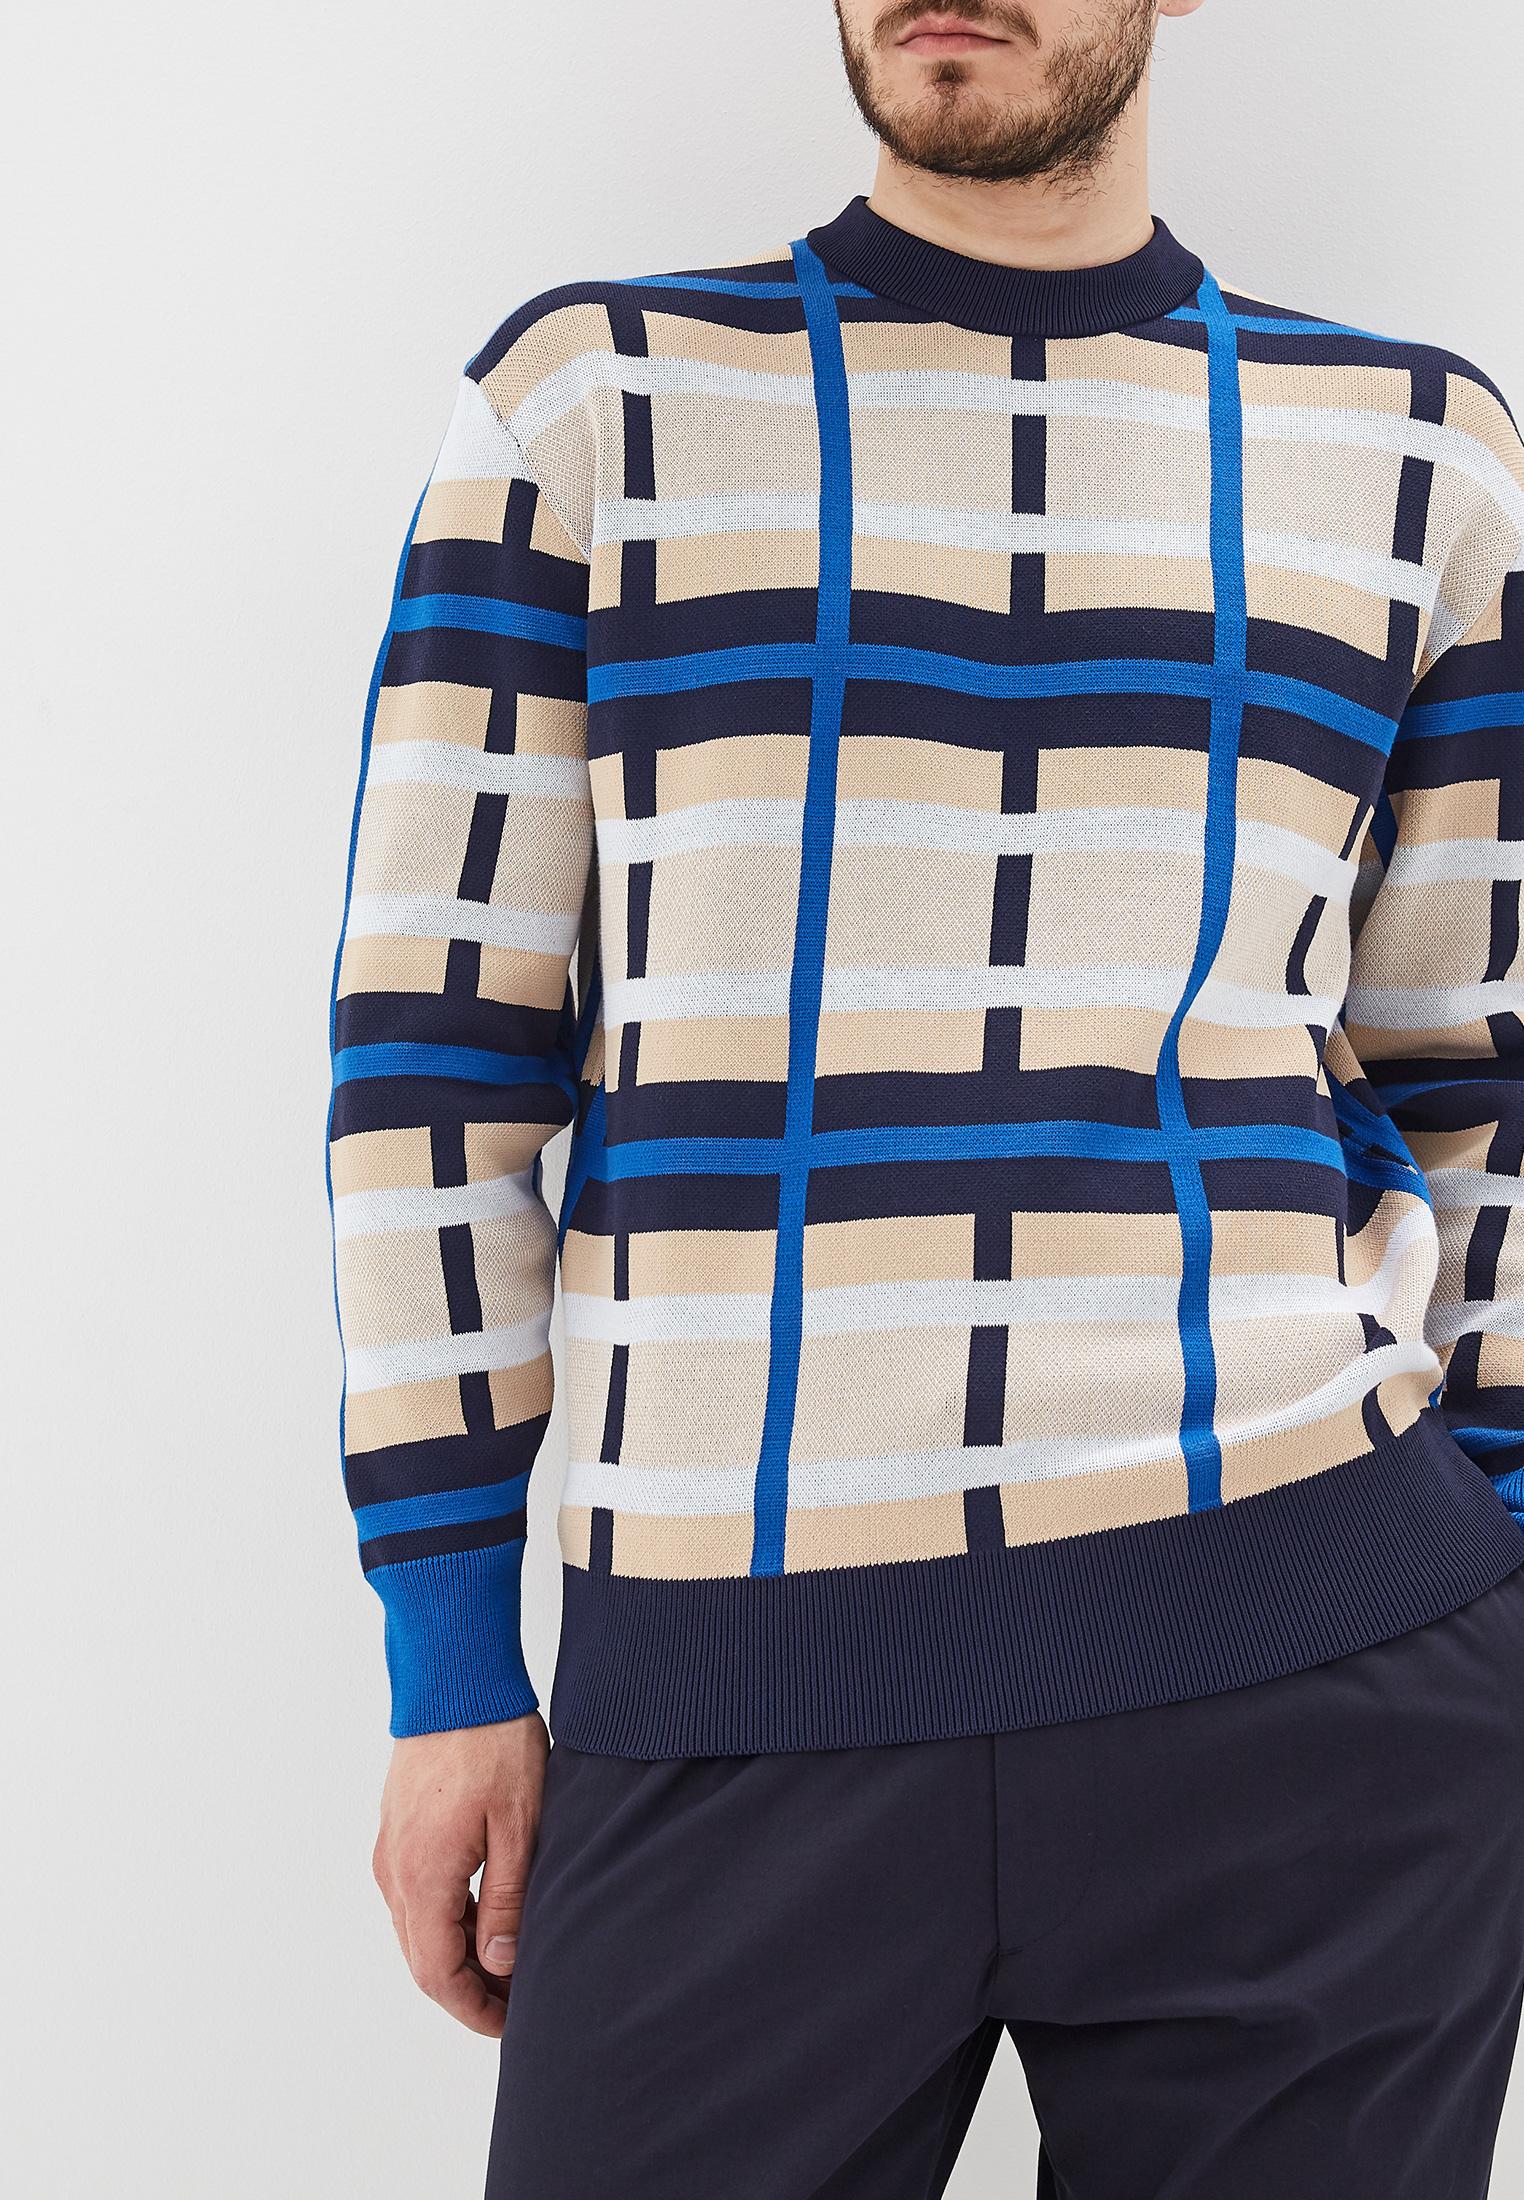 GULLIVER Girls Longsleeve Shirt T-Shirt Long Sleeve Top Blue Round Neck Cotton for Kids 3-8 Years